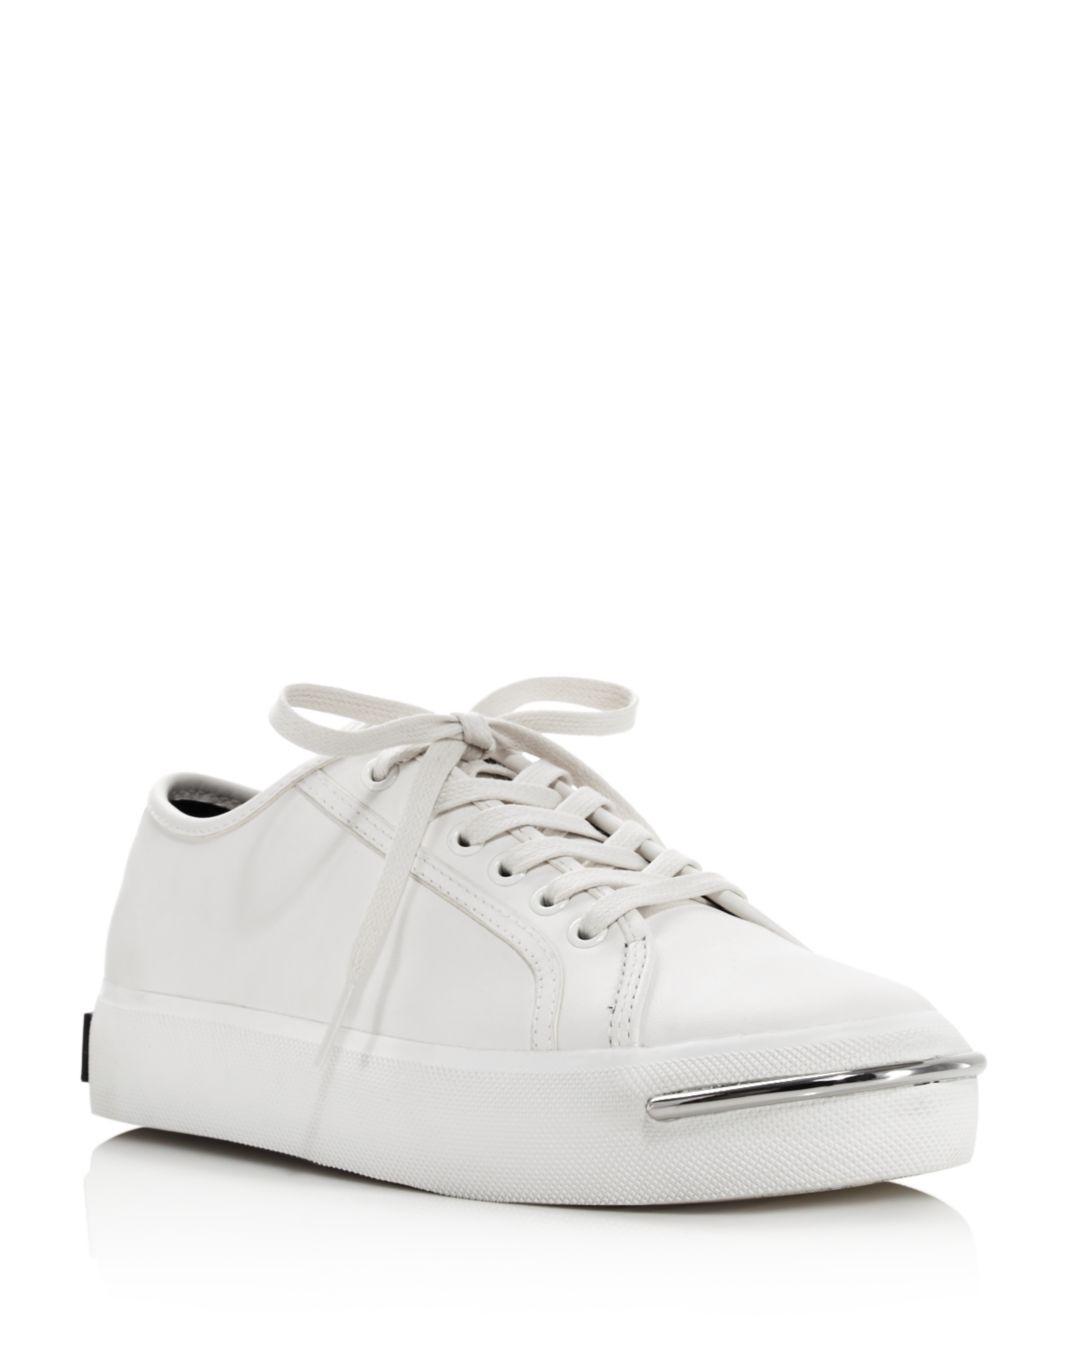 Lyst Wang Low Platform Alexander Sneakers Top Pia Leather Women's DIW2HE9